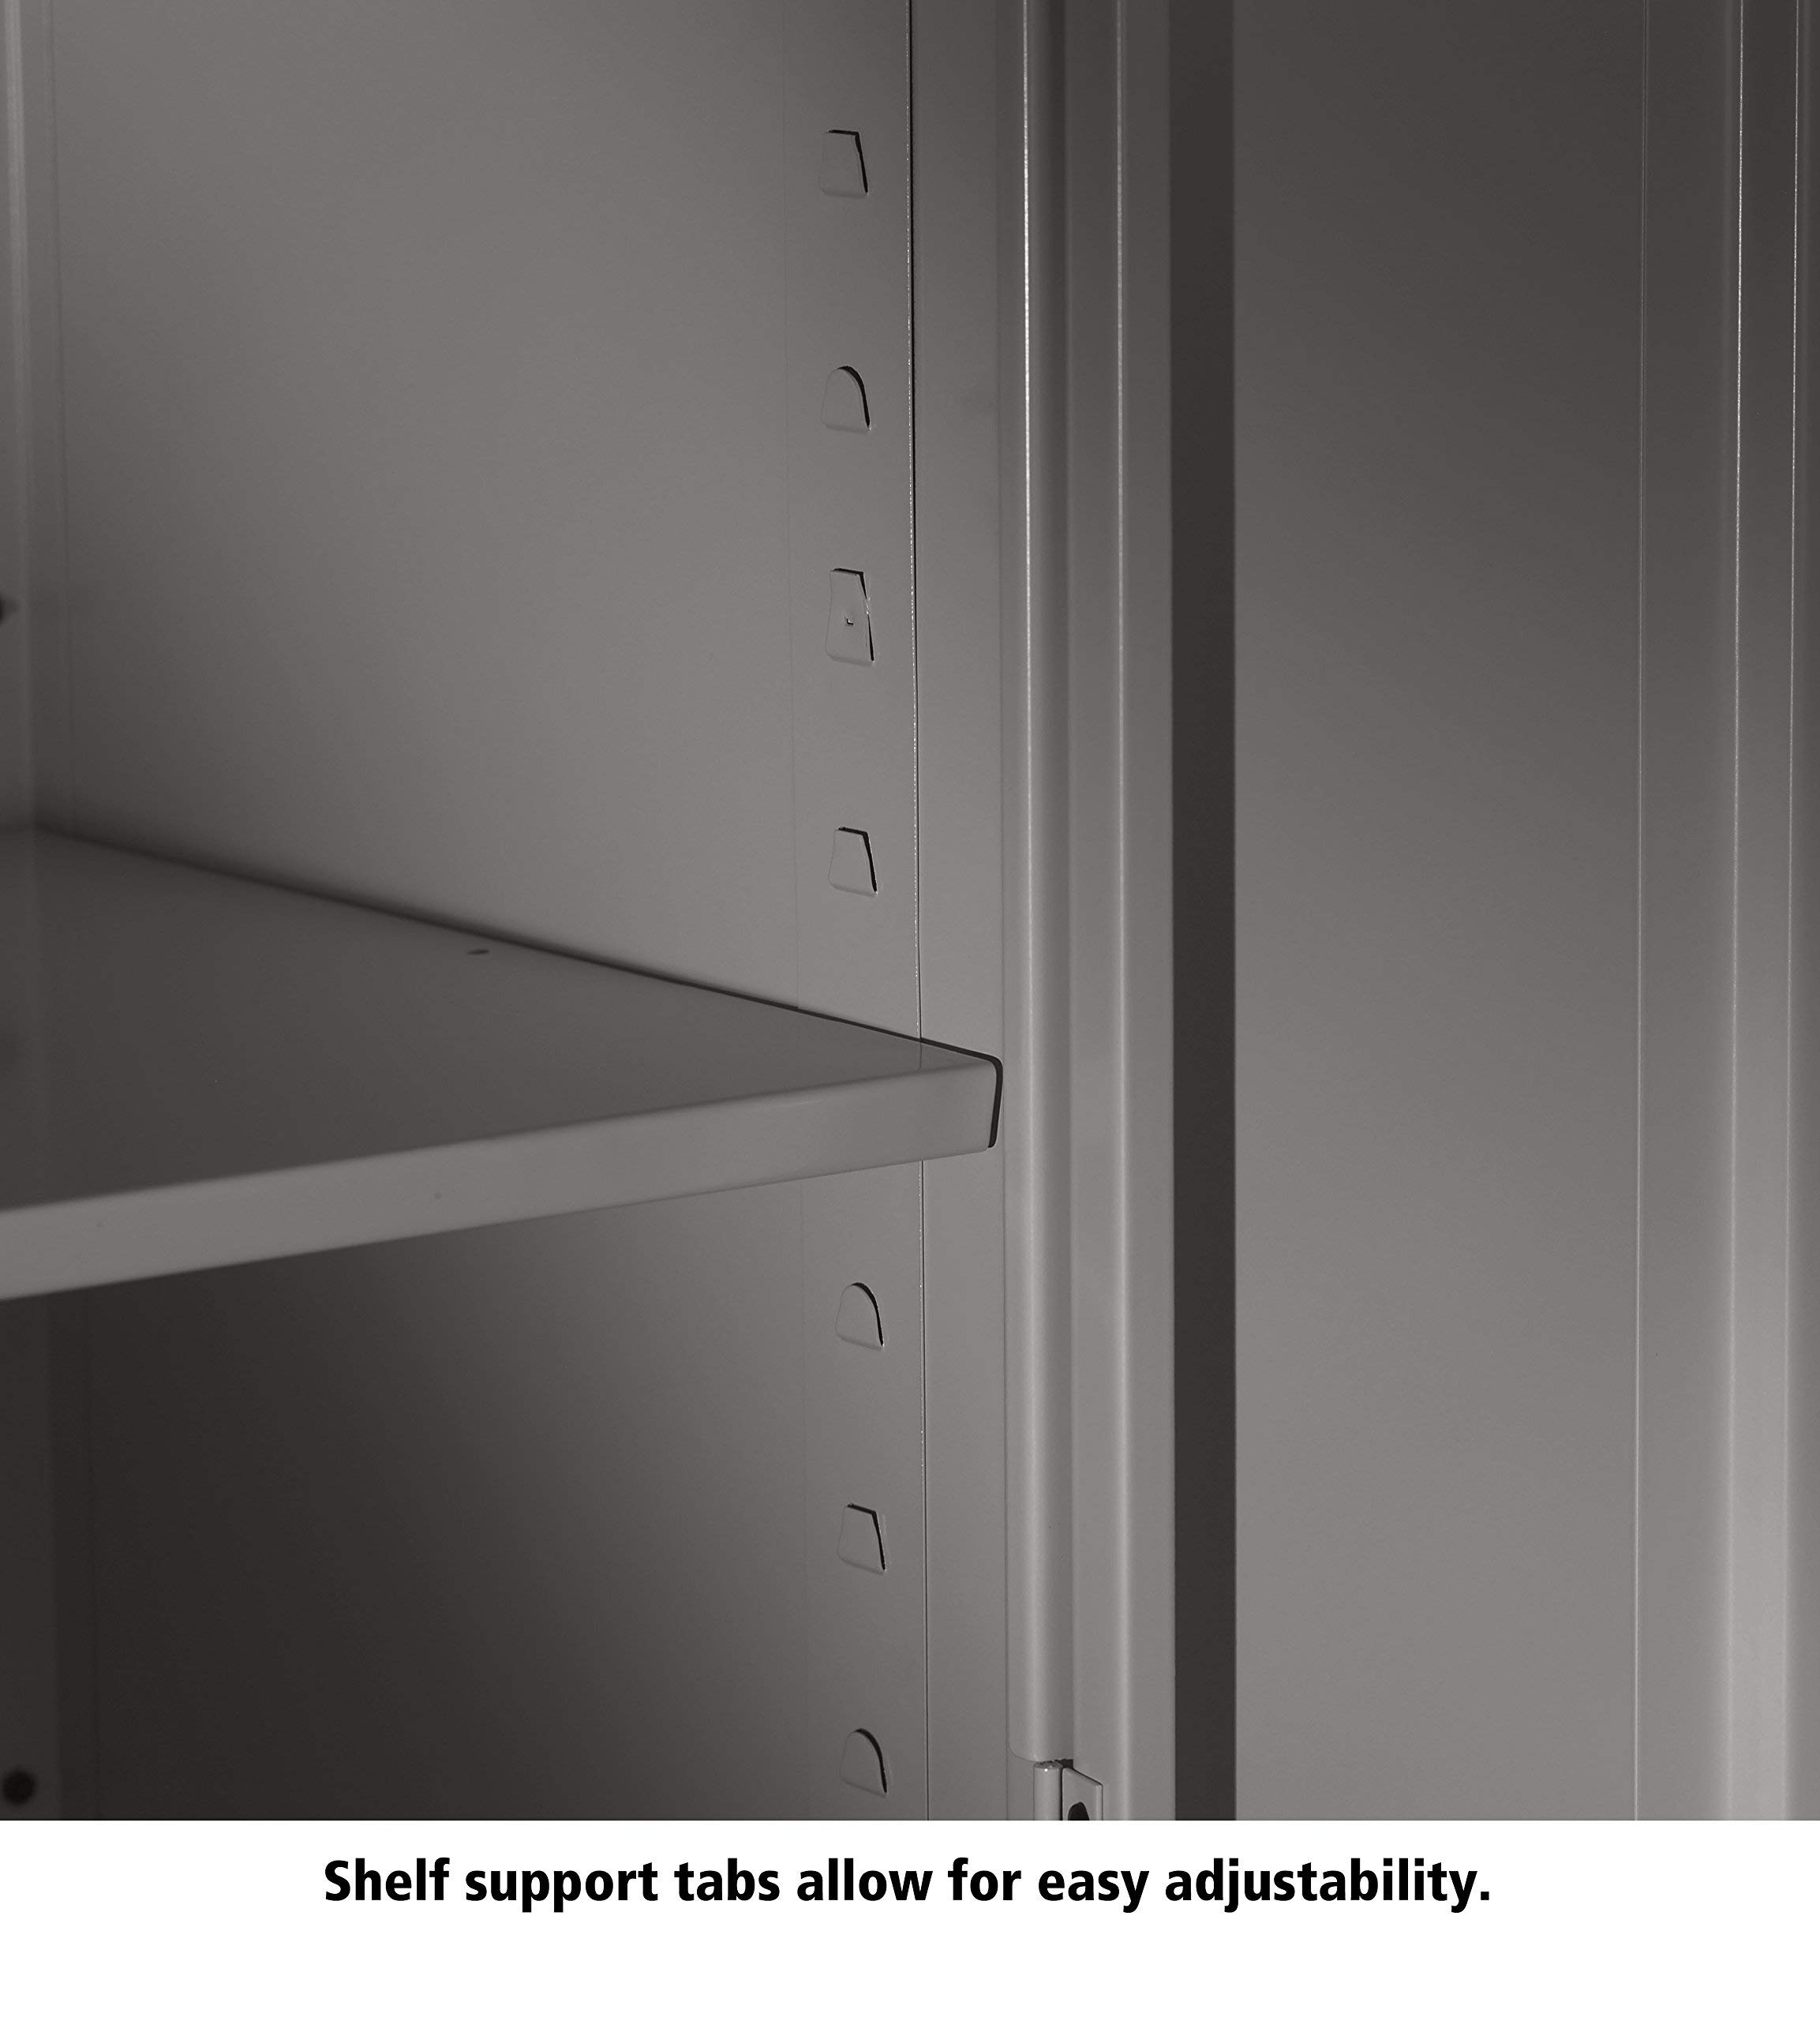 Tennsco 4218 24 Gauge Steel Standard Welded Counter High Cabinet, 2 Shelves, 150 lbs Capacity per Shelf, 36'' Width x 42'' Height x 18'' Depth, Black (Renewed) by Tennsco (Image #5)